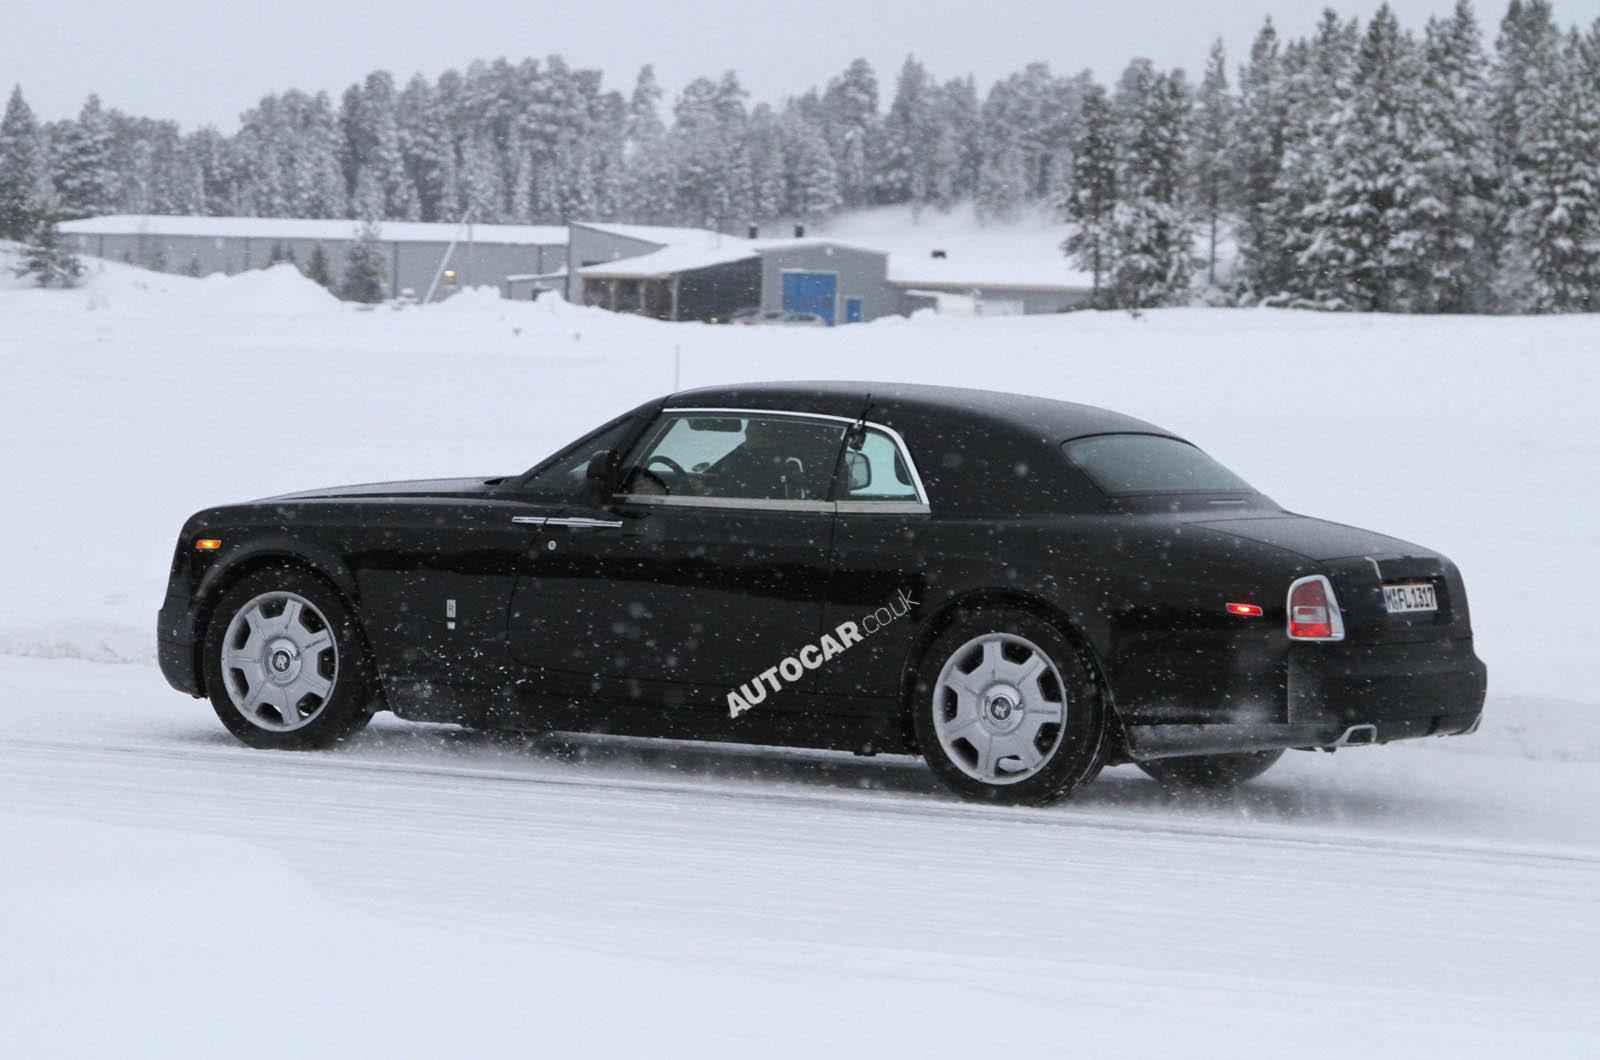 Geneva motor show 2012 rolls royce phantom autocar for Rolls royce phantom motor